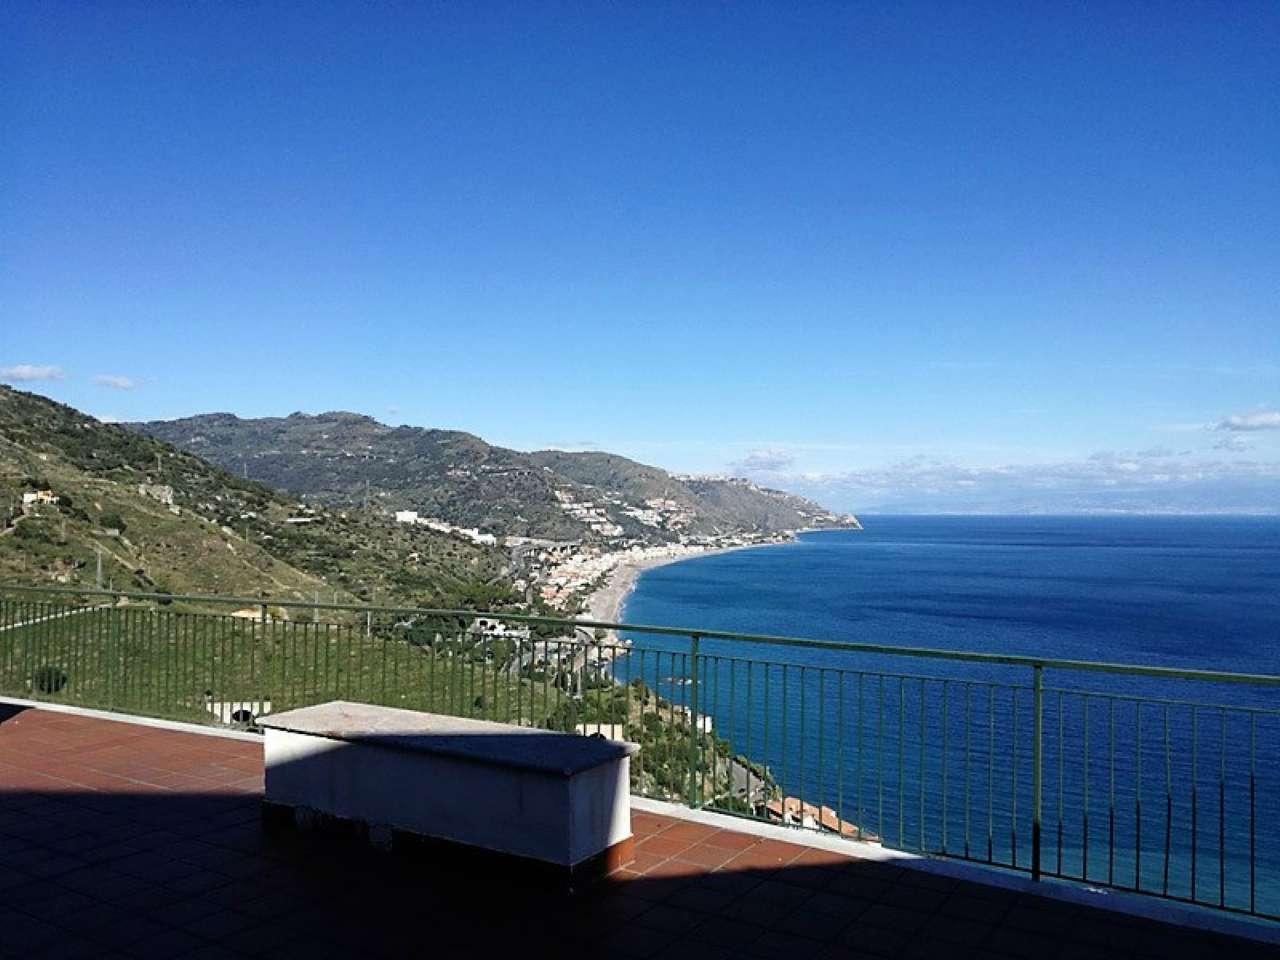 Appartamento in vendita a Taormina, 9999 locali, Trattative riservate | CambioCasa.it